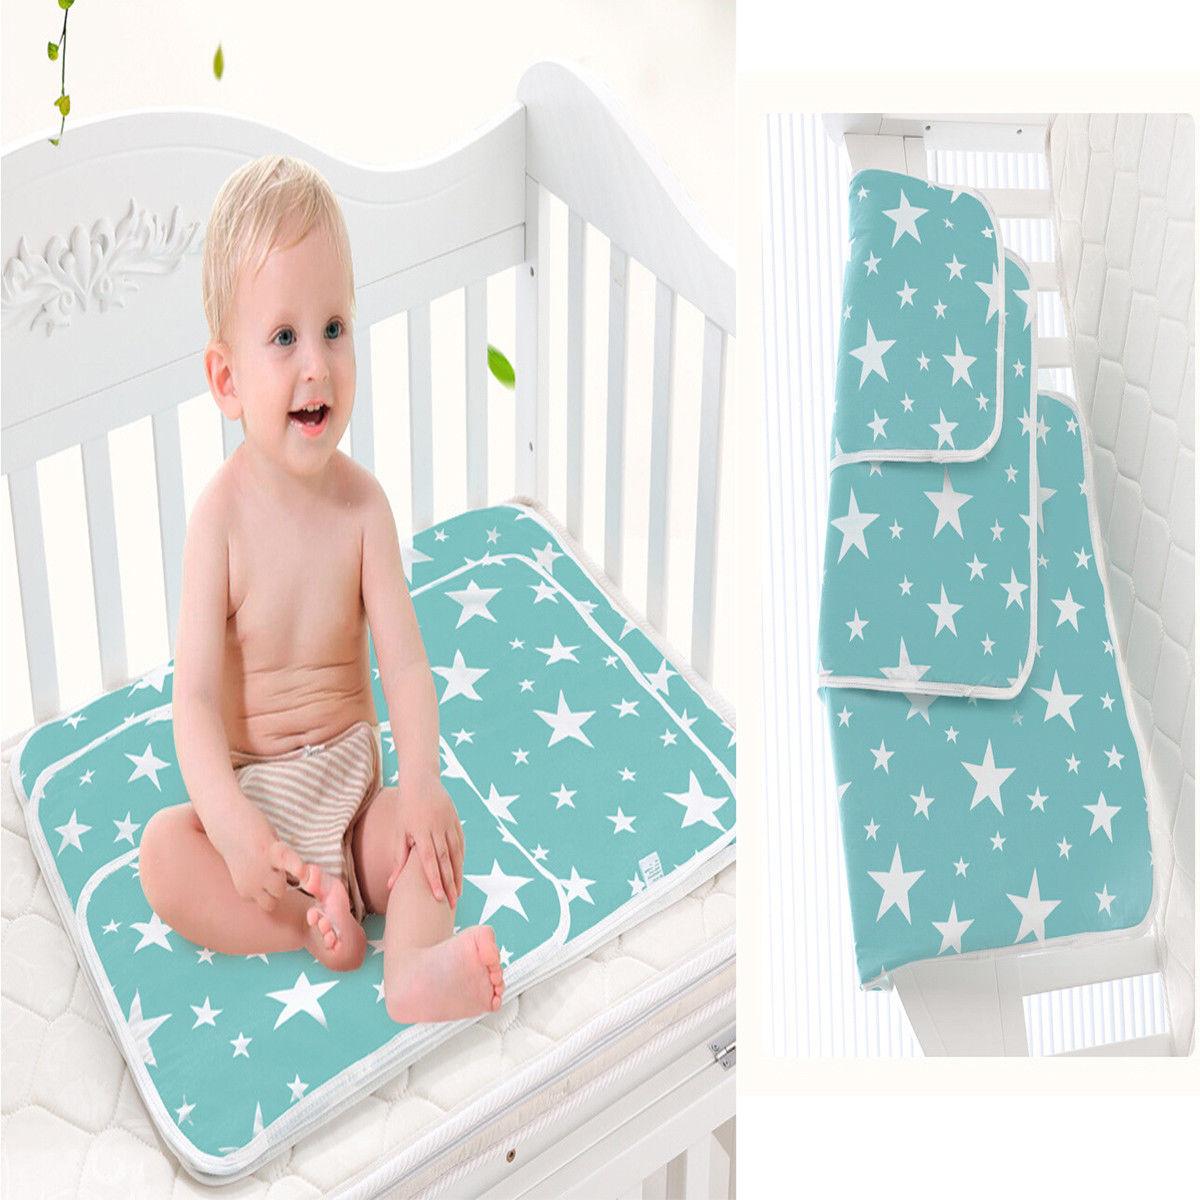 Washable Newborn Baby Mattress Breathable Supplies Waterproof Crib Sheet Urine Supply Mattresses